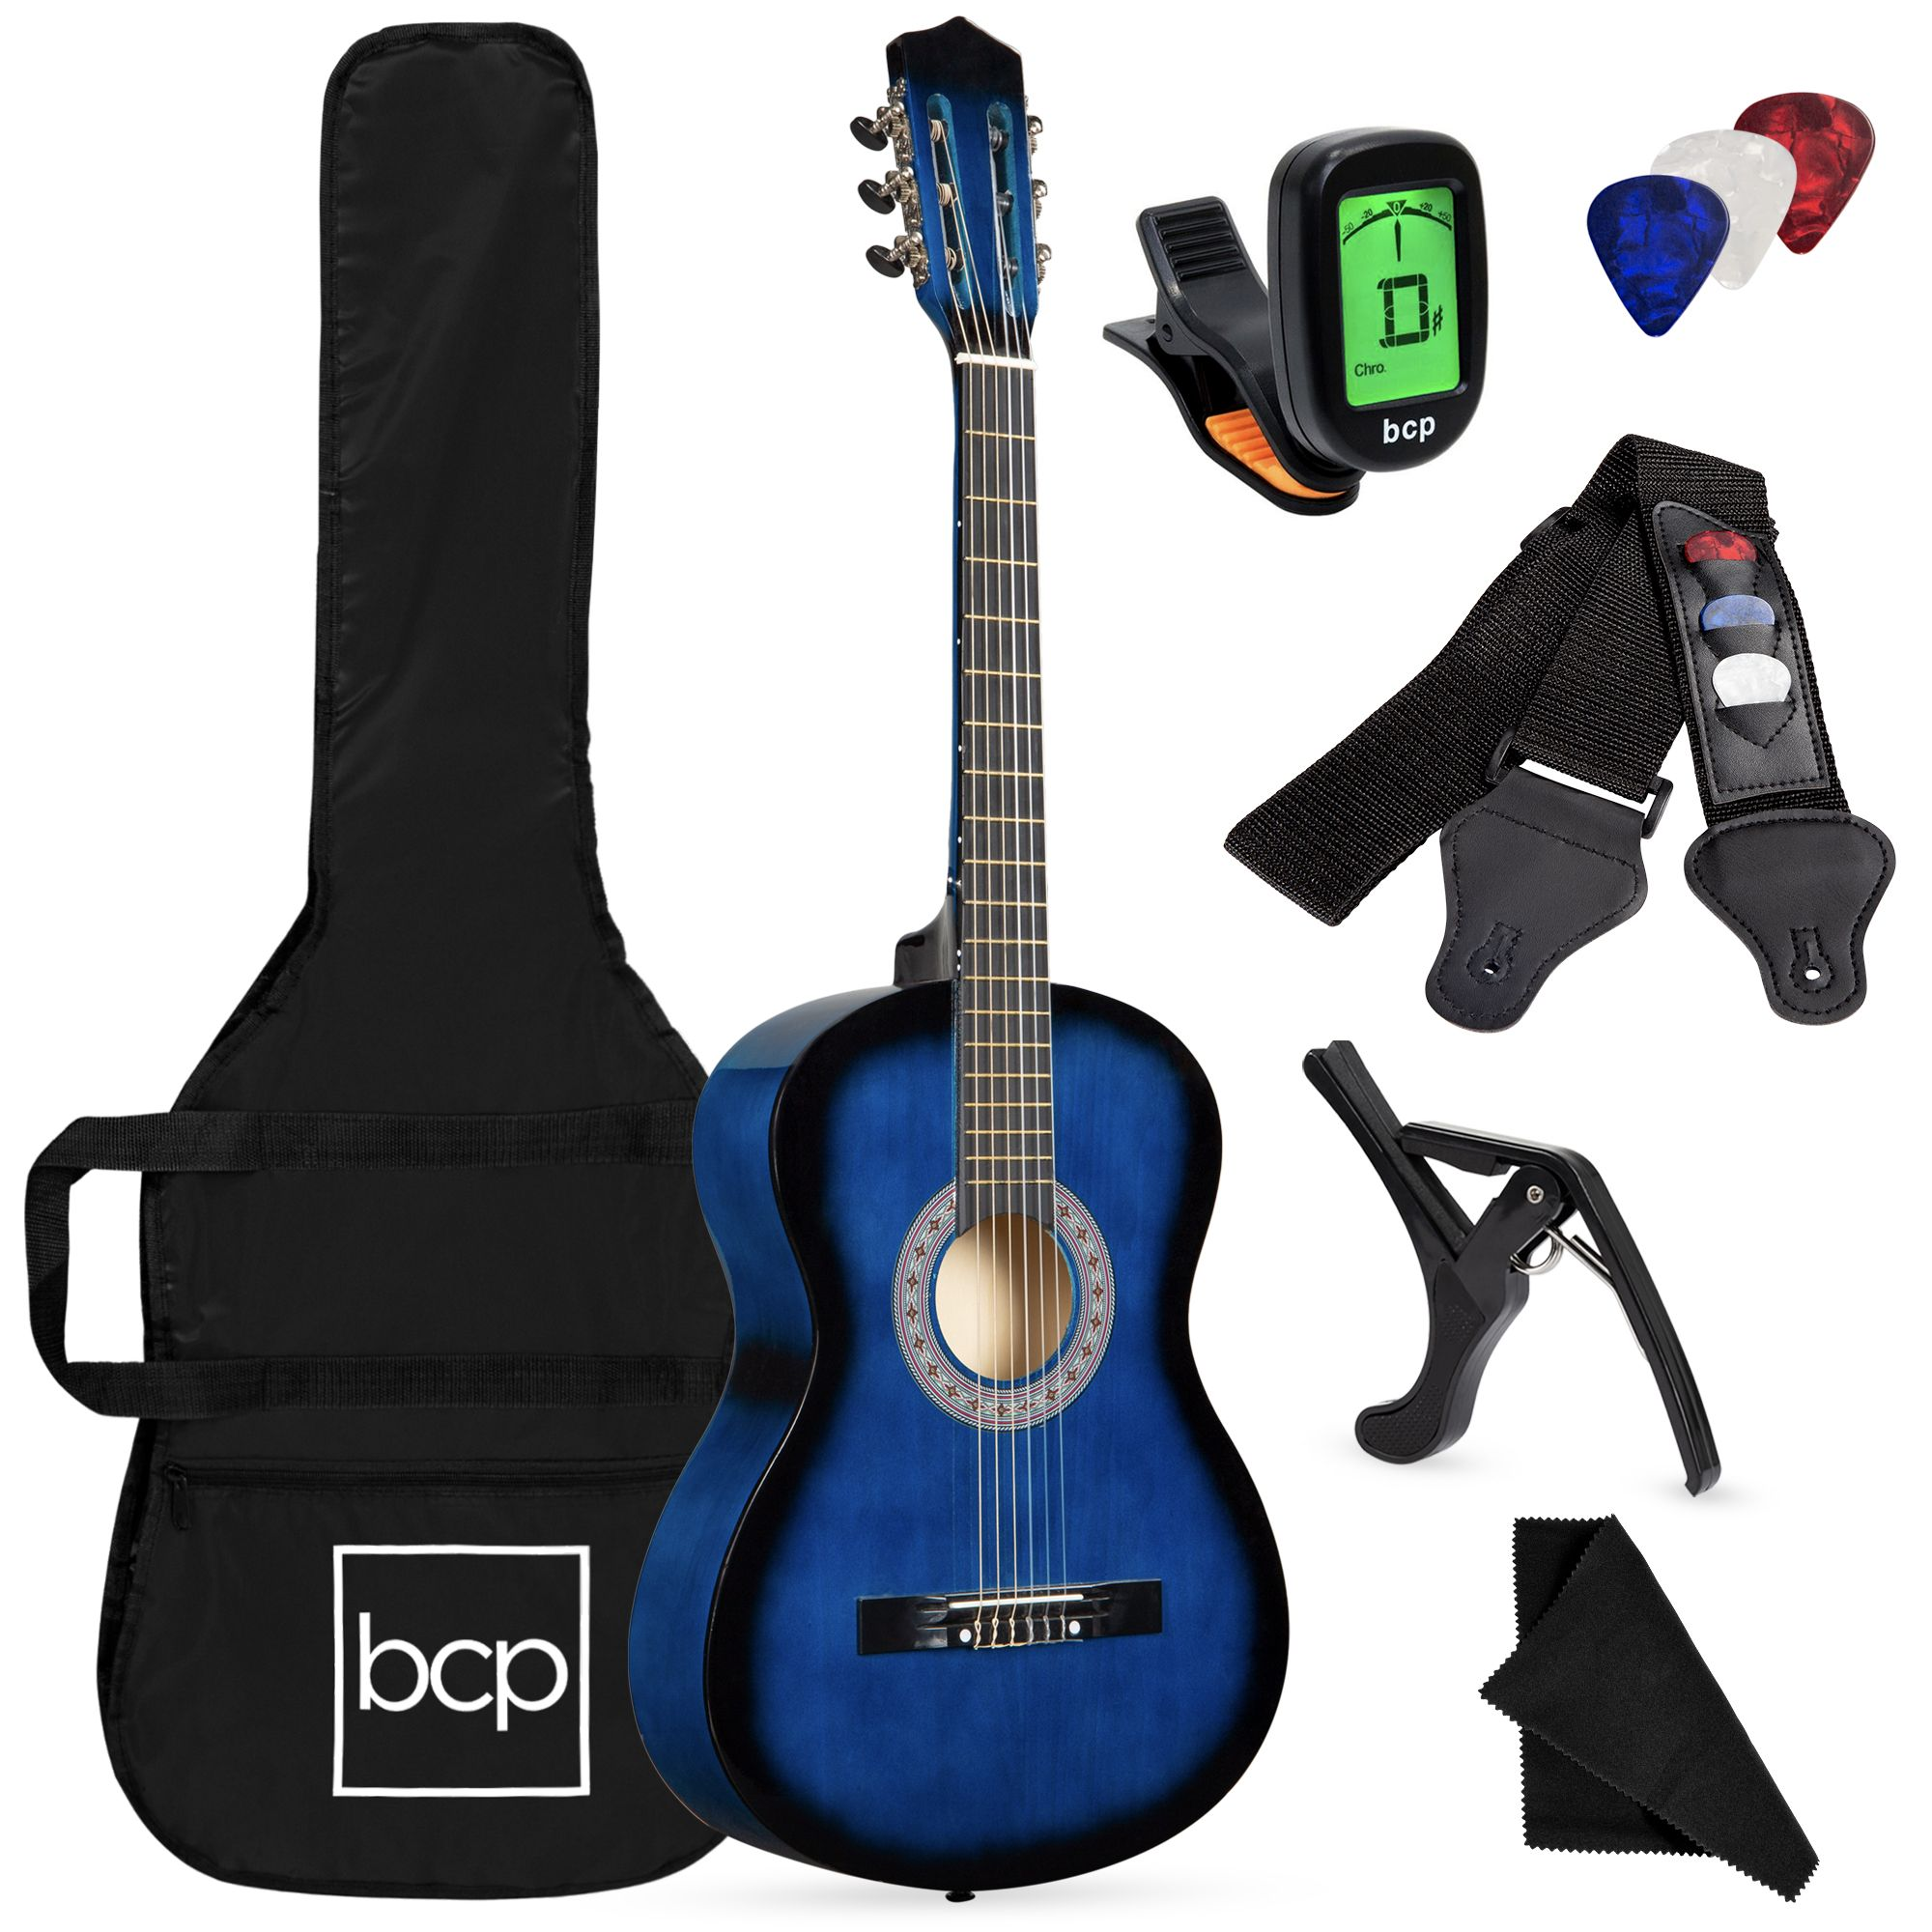 Best Choice Products 38in Beginner Acoustic Guitar Starter Kit W Case Strap Digital Tuner Pick Strings Blueburst Walmart Com In 2021 Digital Tuner Acoustic Guitar Guitar